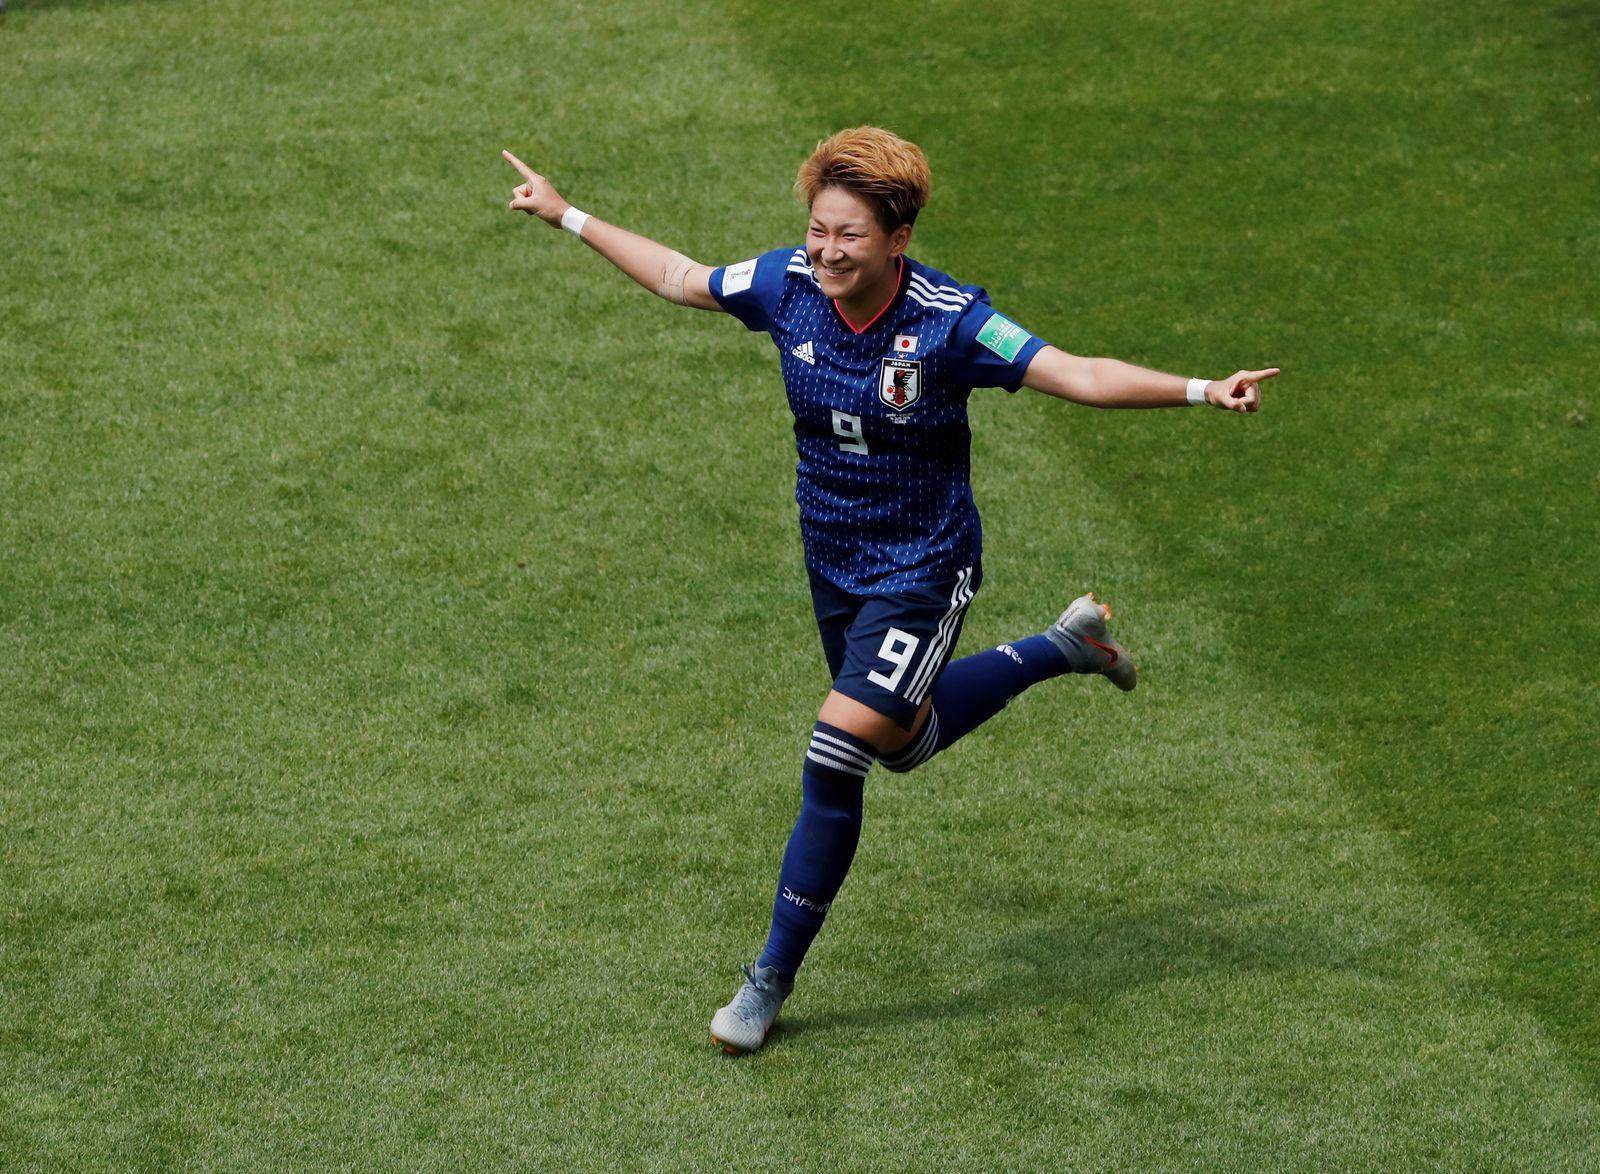 SOCCER-WORLDCUP-JPN-SCO/